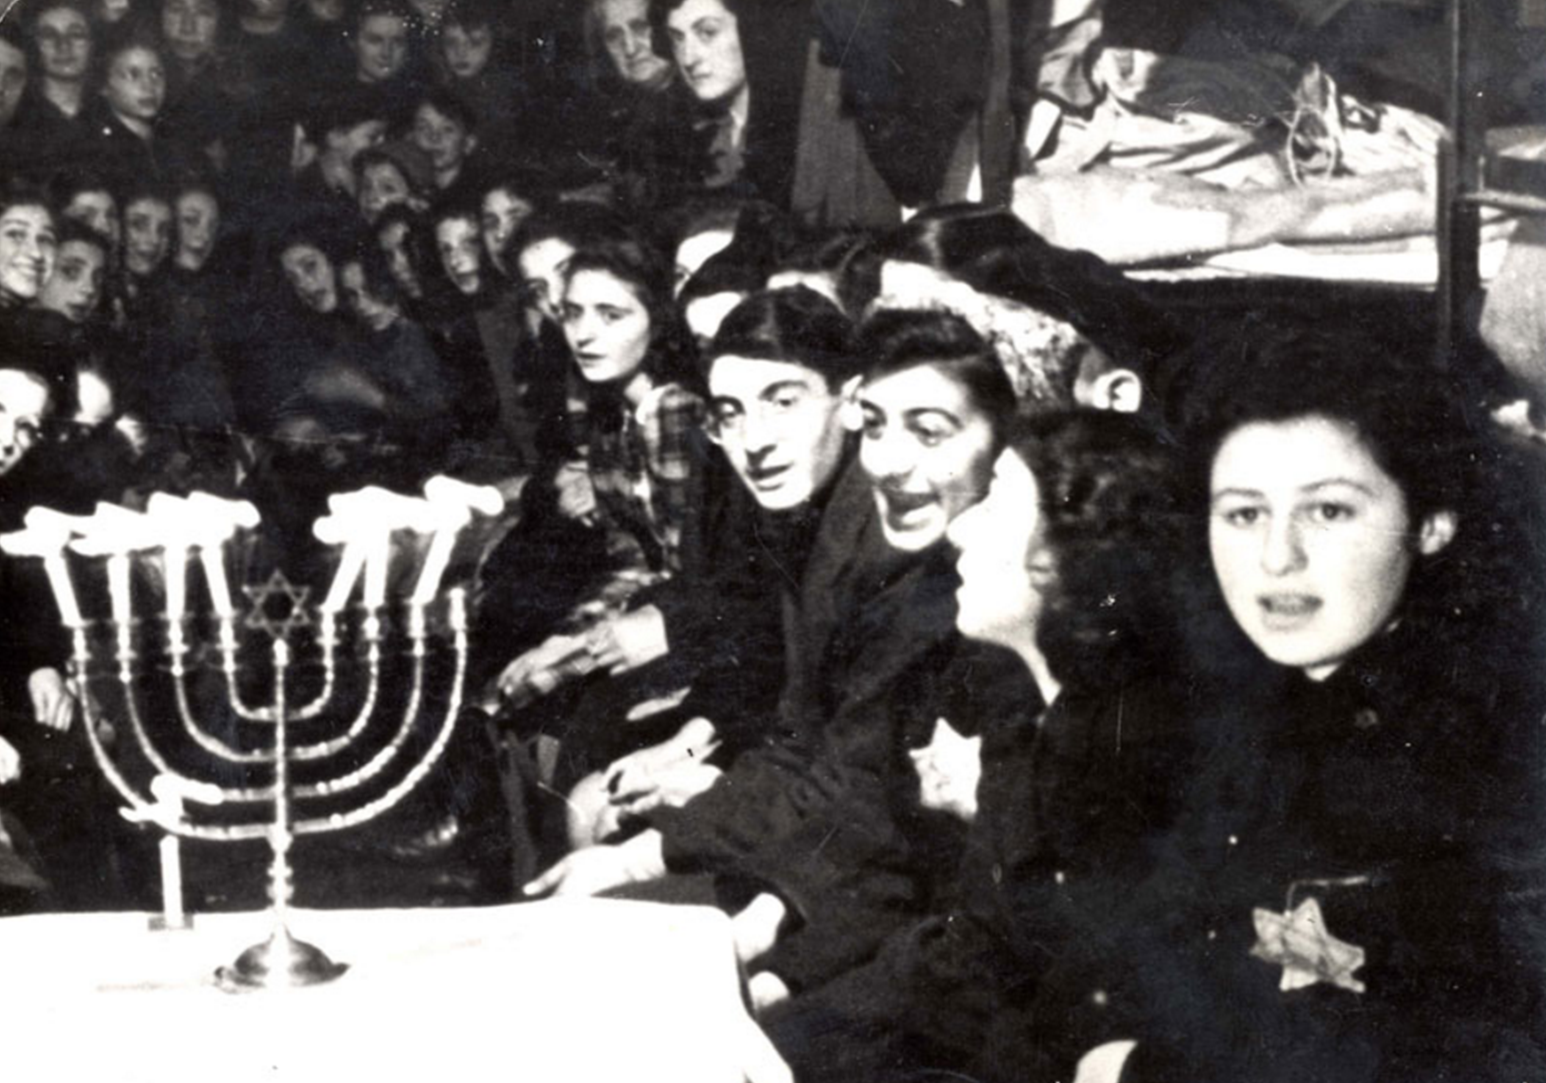 Chanukah Westerbork 1943